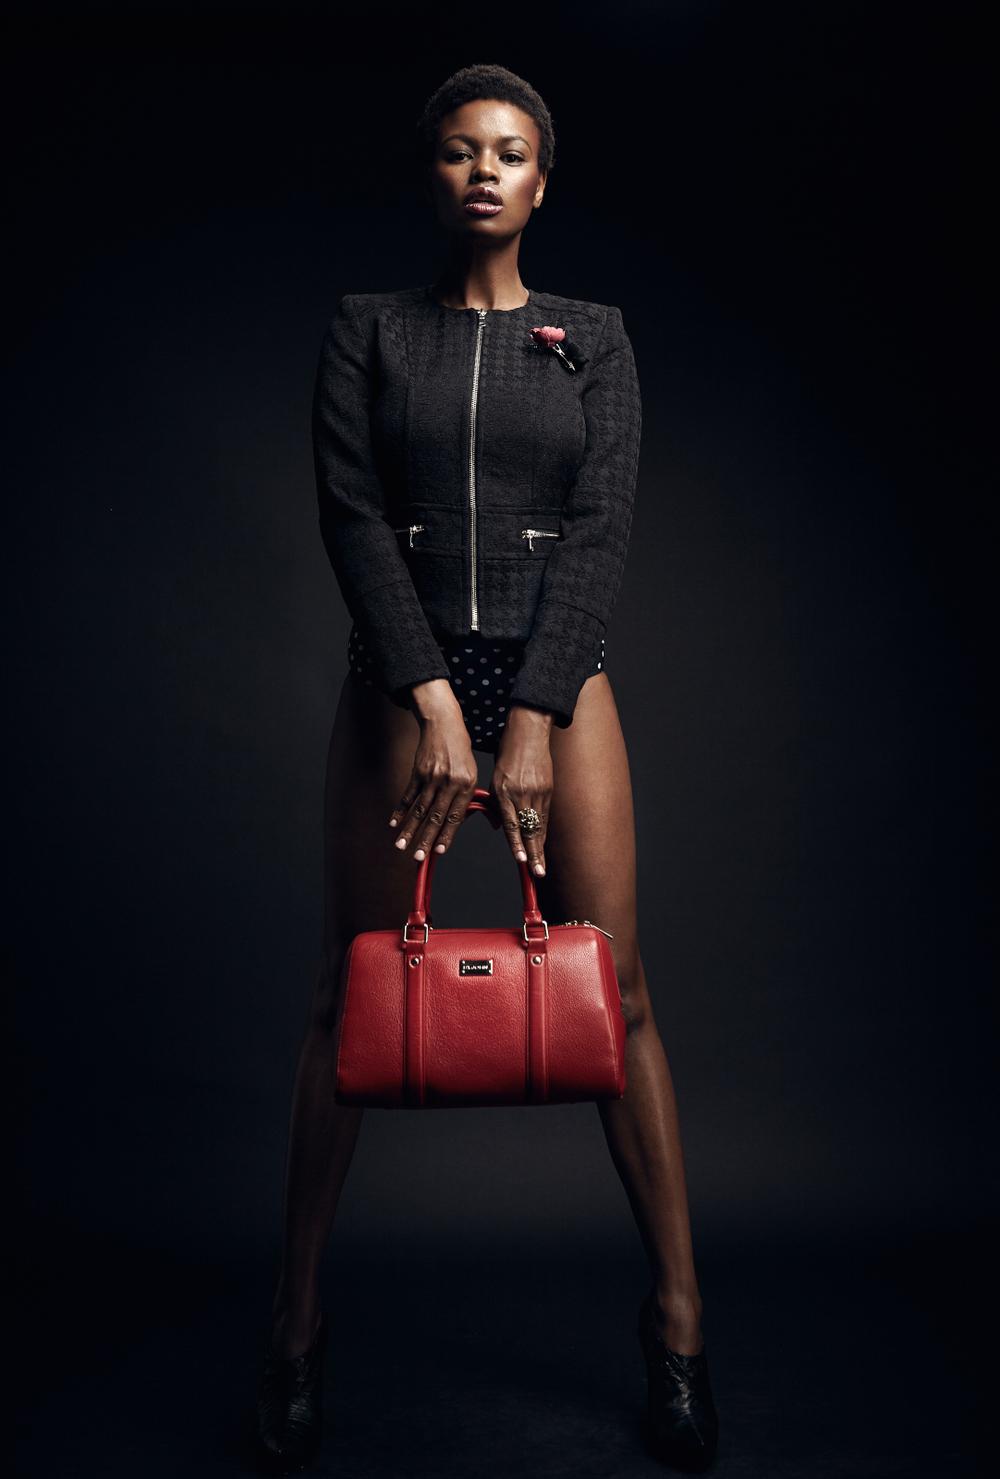 Vancouver Canadian Fashion Photographer Melita E.jpg